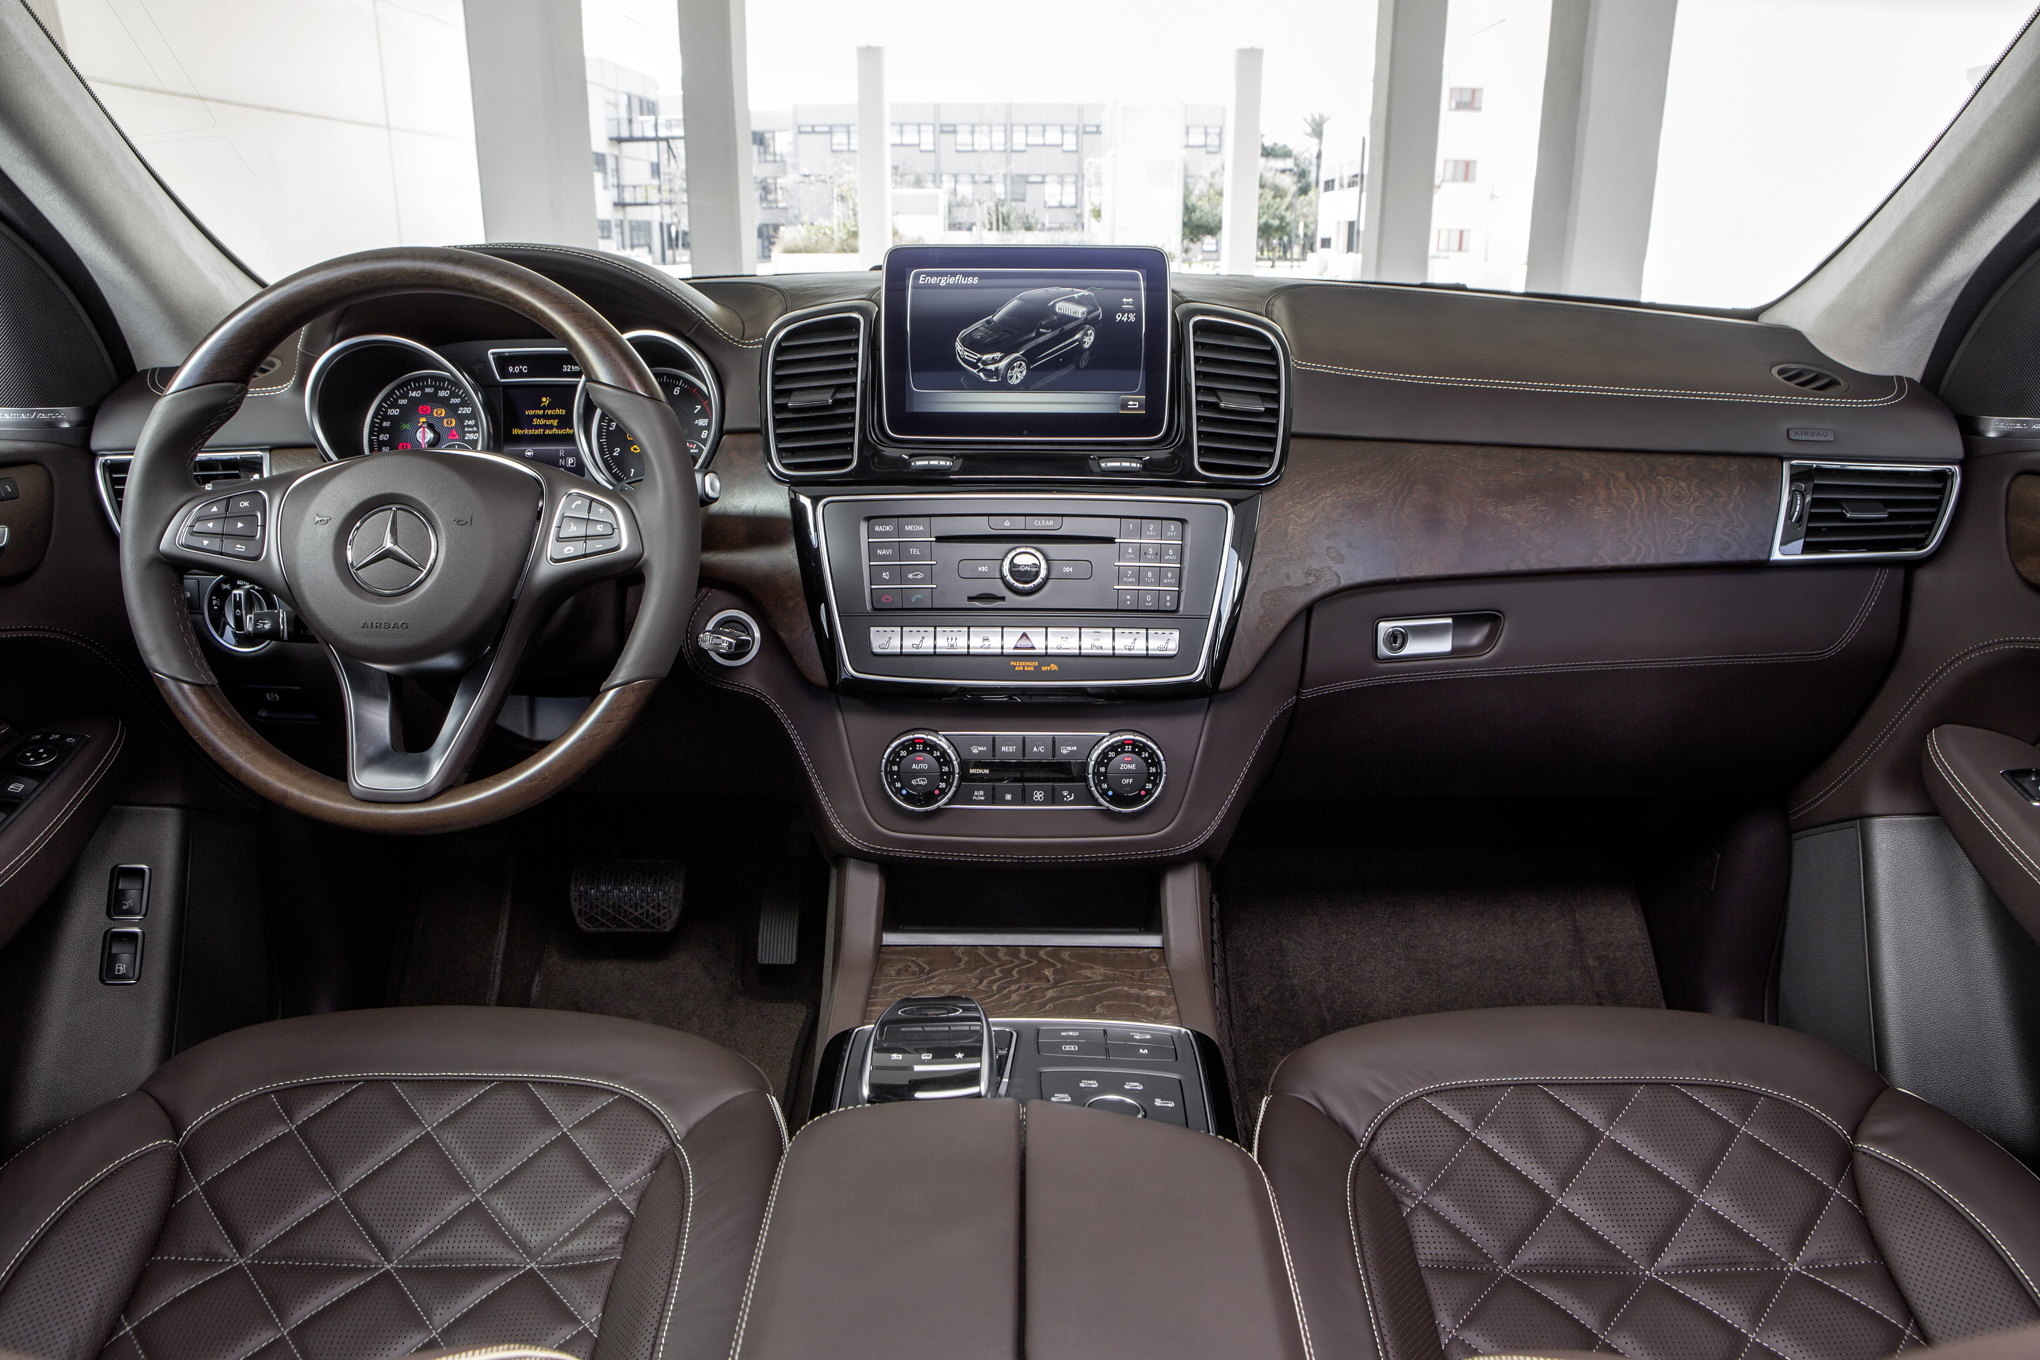 Mercedes Benz GLE Coupe Screenshots